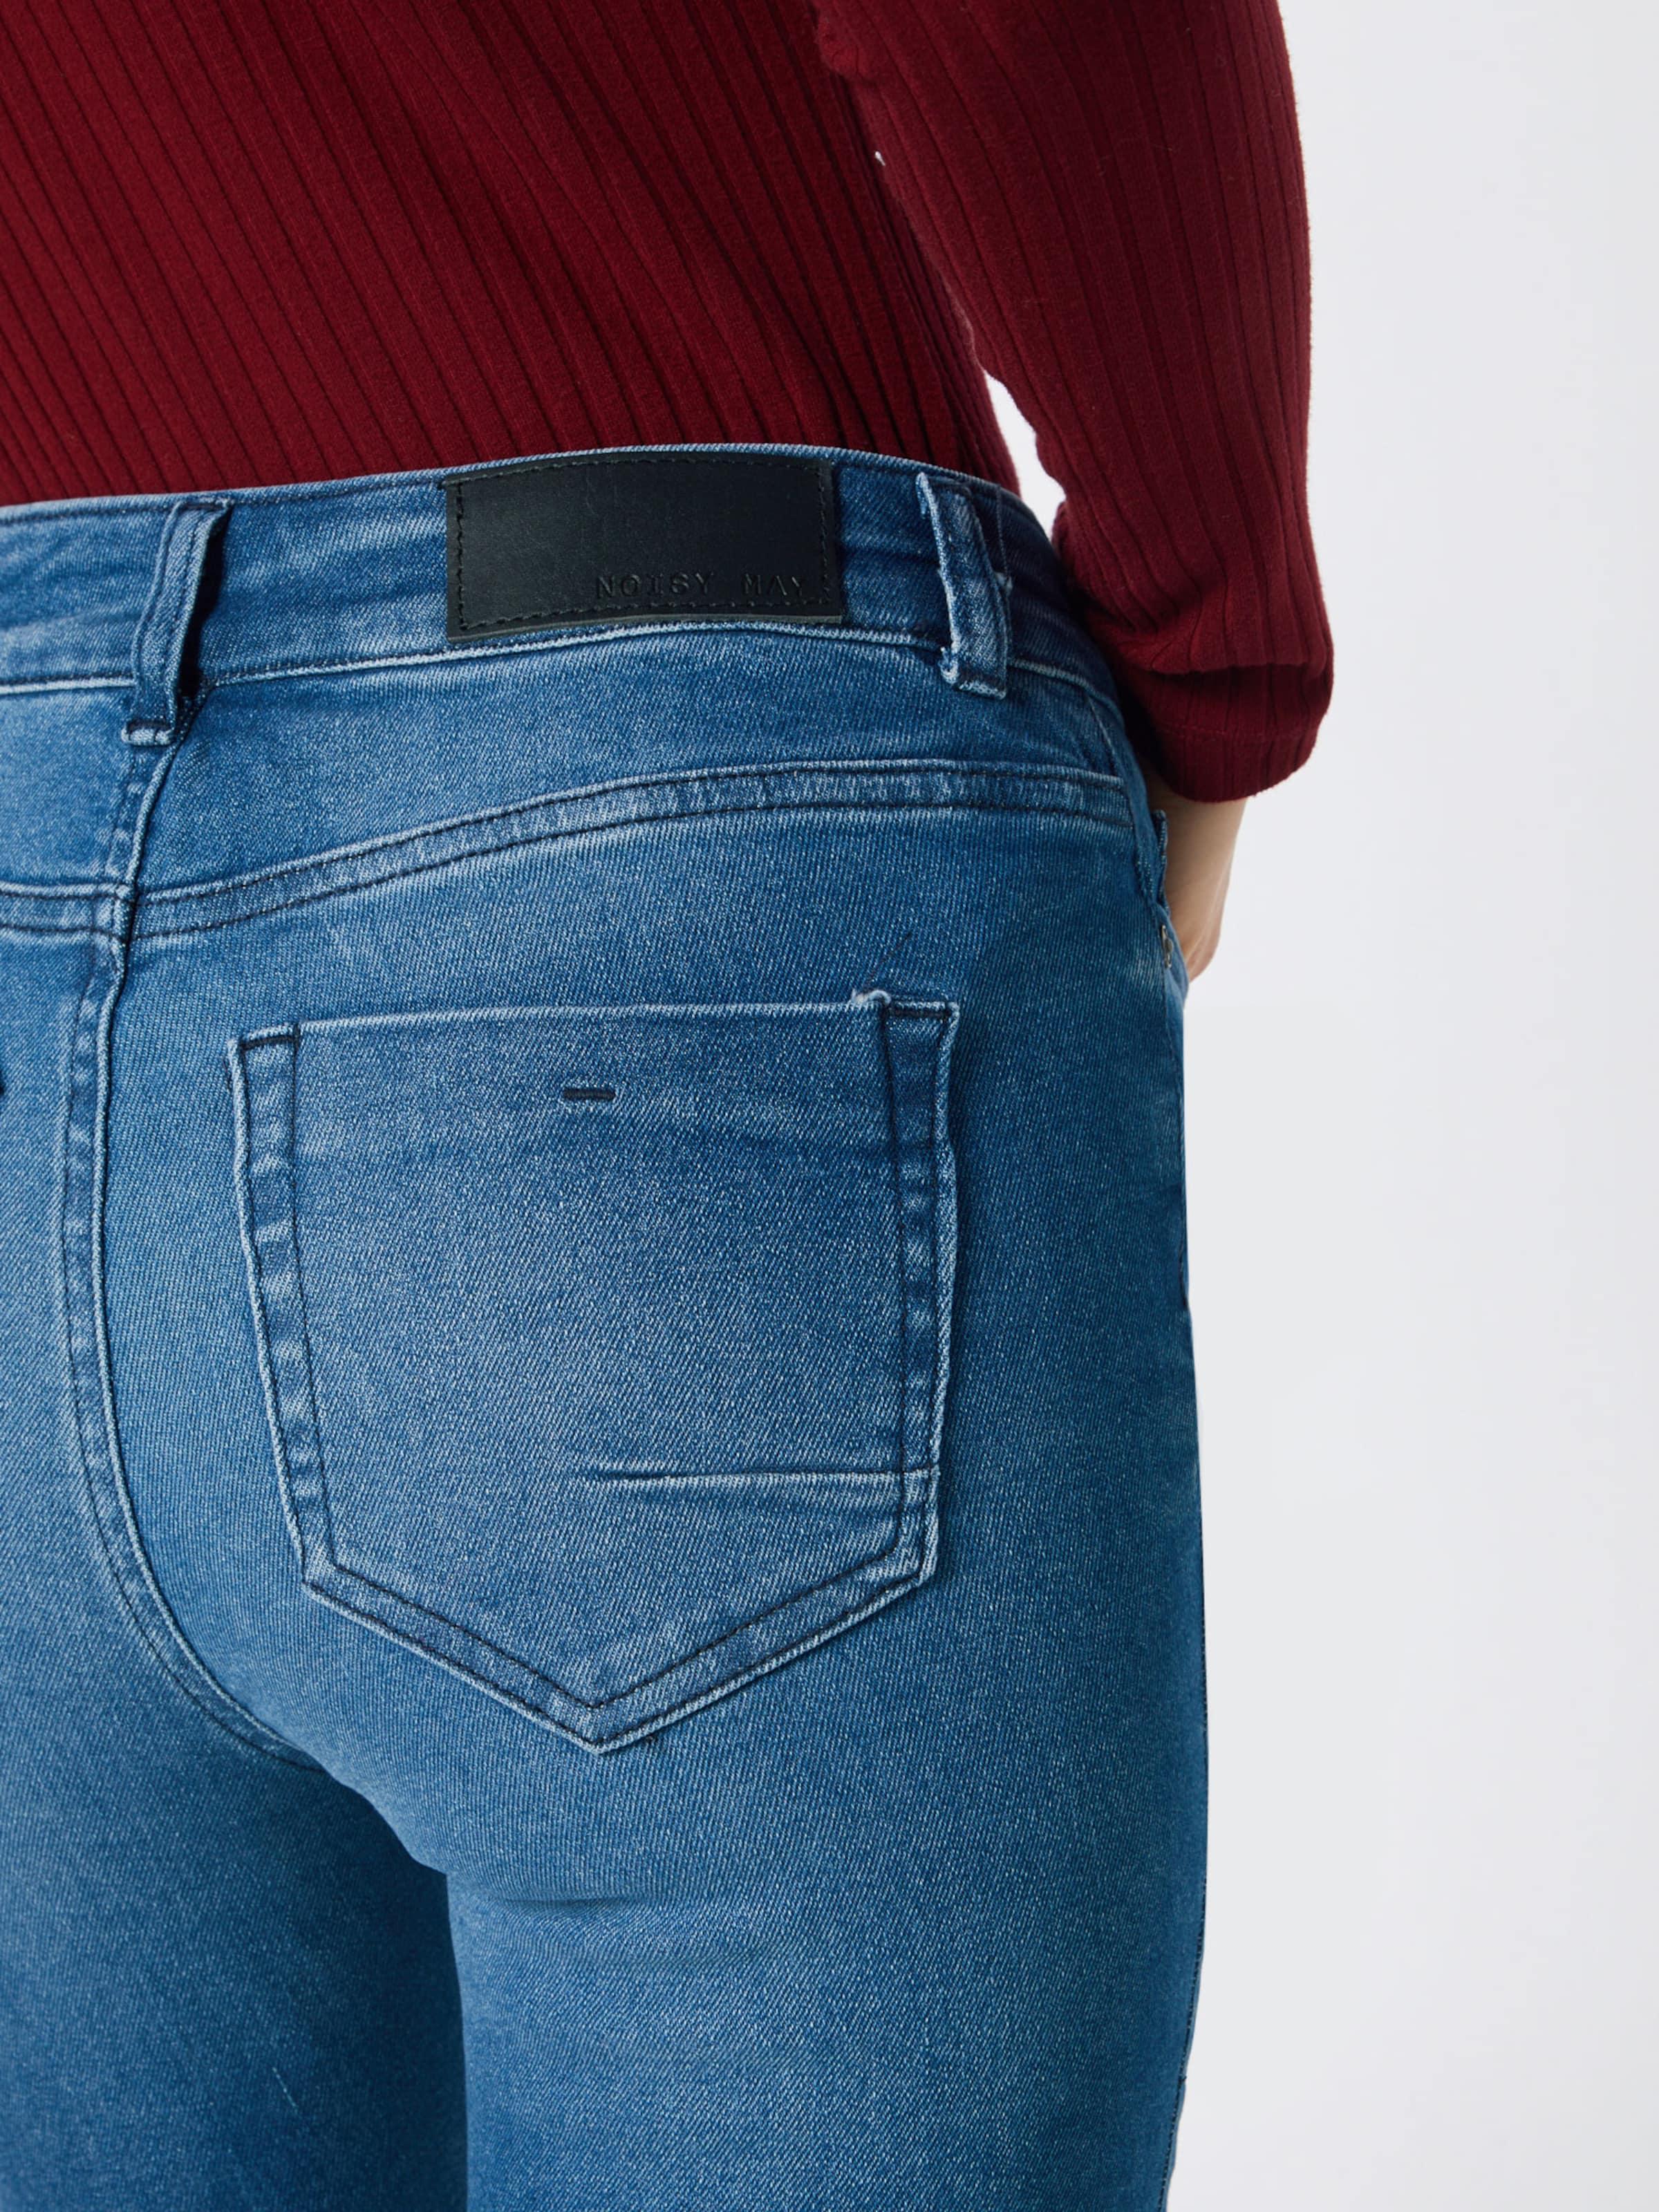 Noisy Bleu 'nmlucy Skinny Jean Denim Prim Jeans Nw Ba019mb' May En 54j3ALcRq